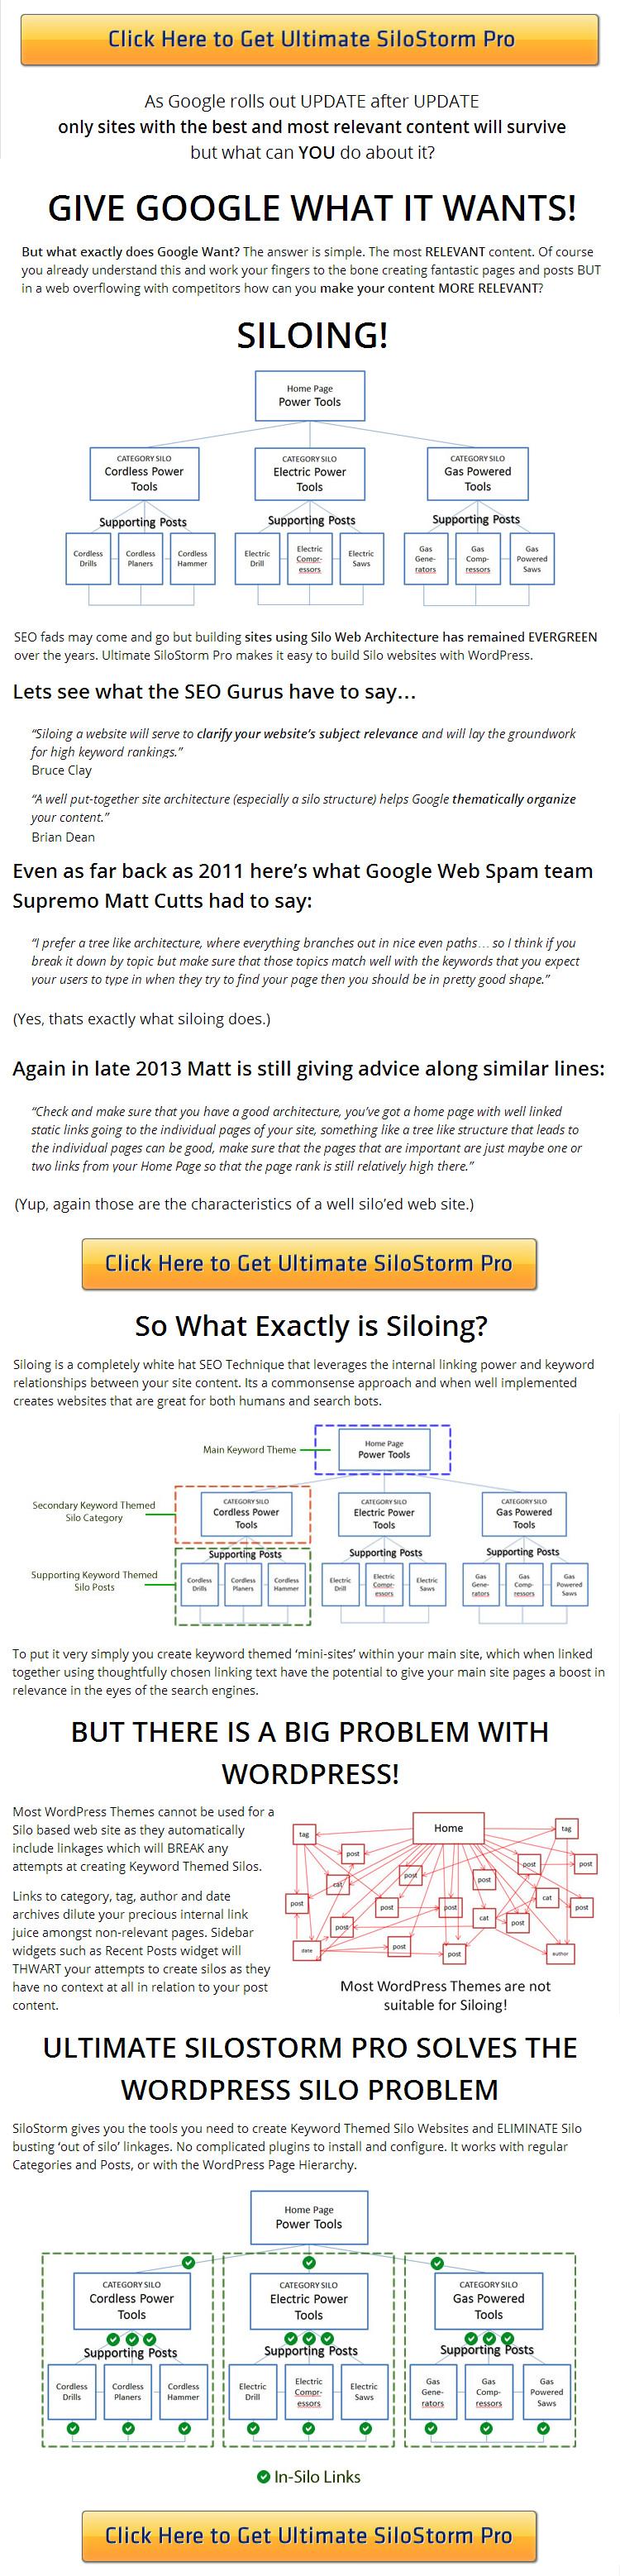 ULTIMATE SILOSTORM PRO - WordPress SILO SEO Theme - NEW from HEATMAPTHEME-2